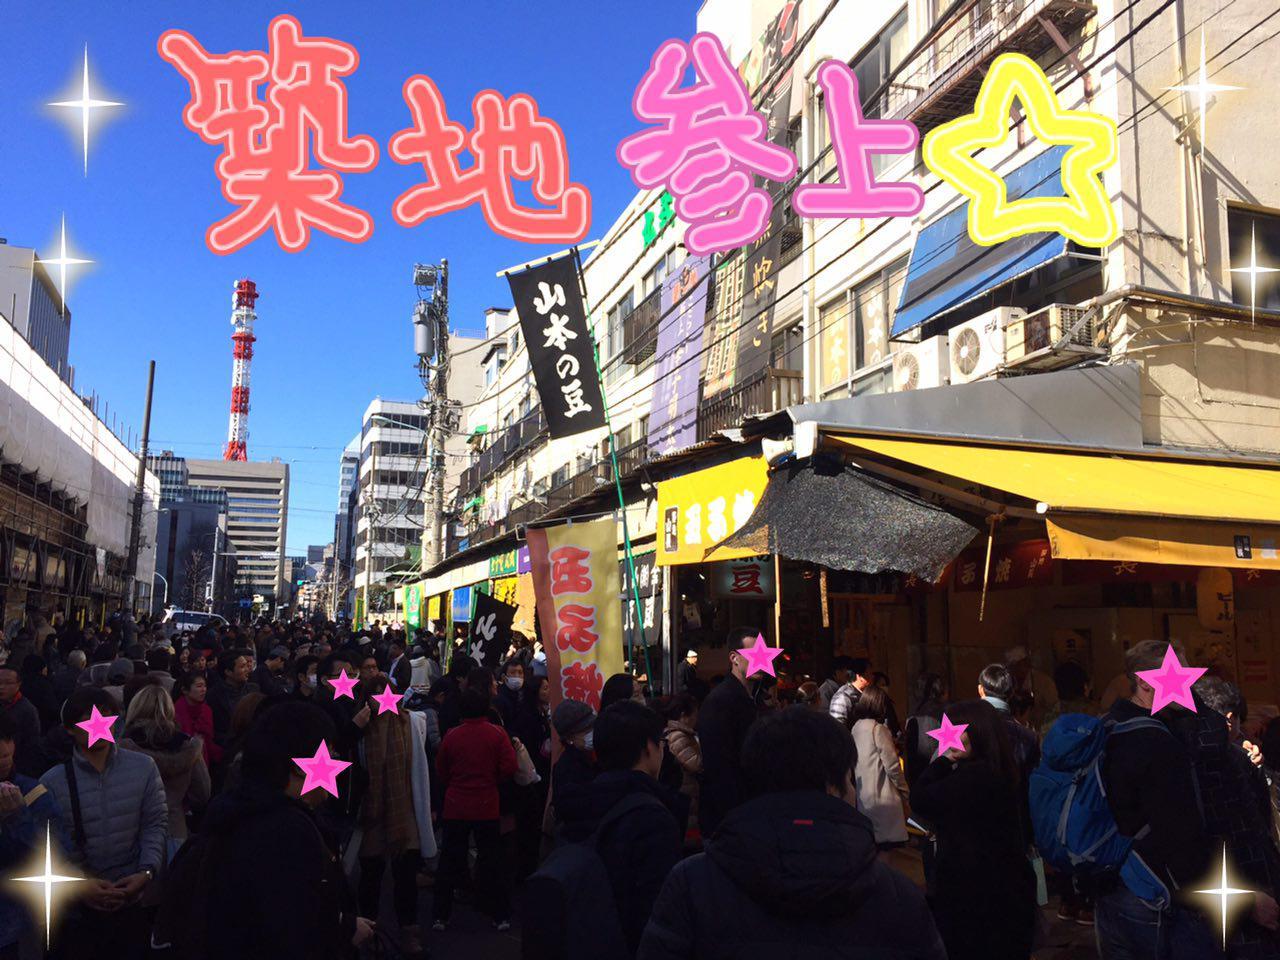 photo_2017-02-12_22-17-29.jpg